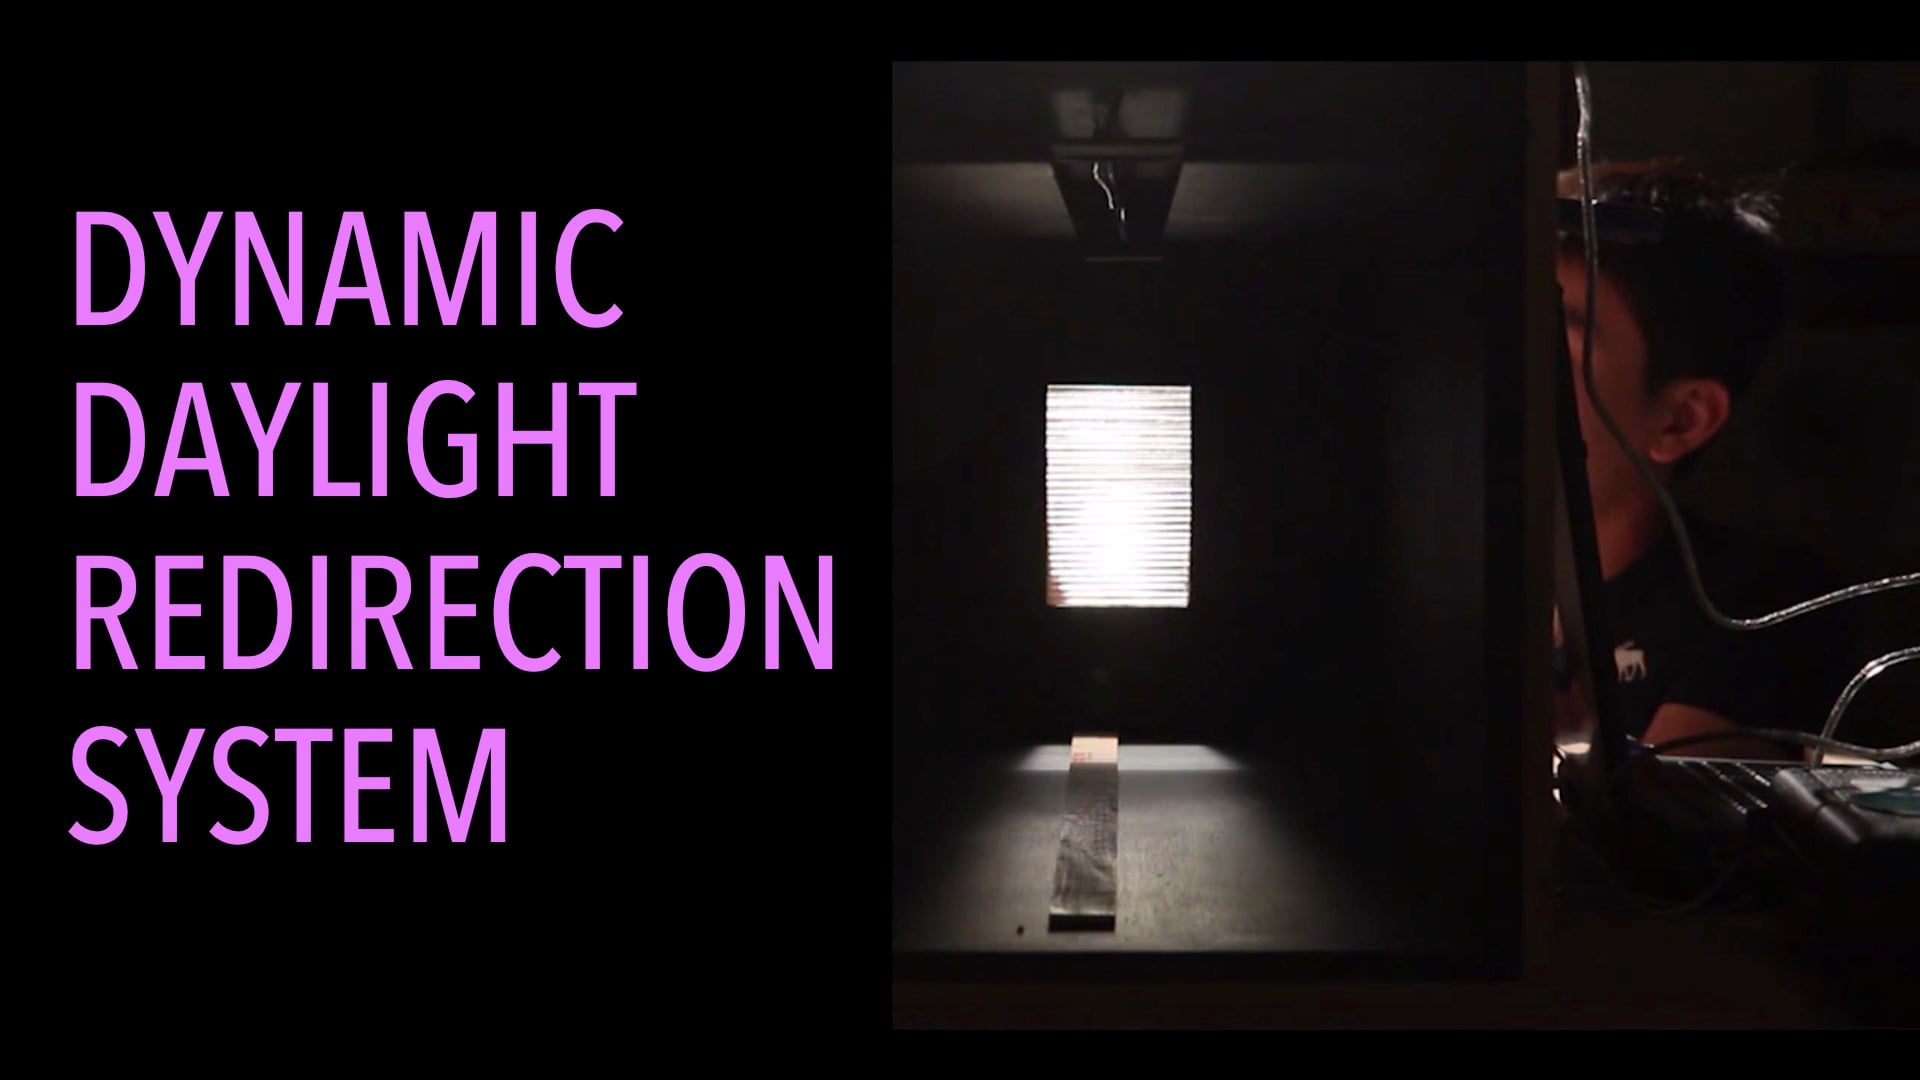 Dynamic Daylight Redirection System